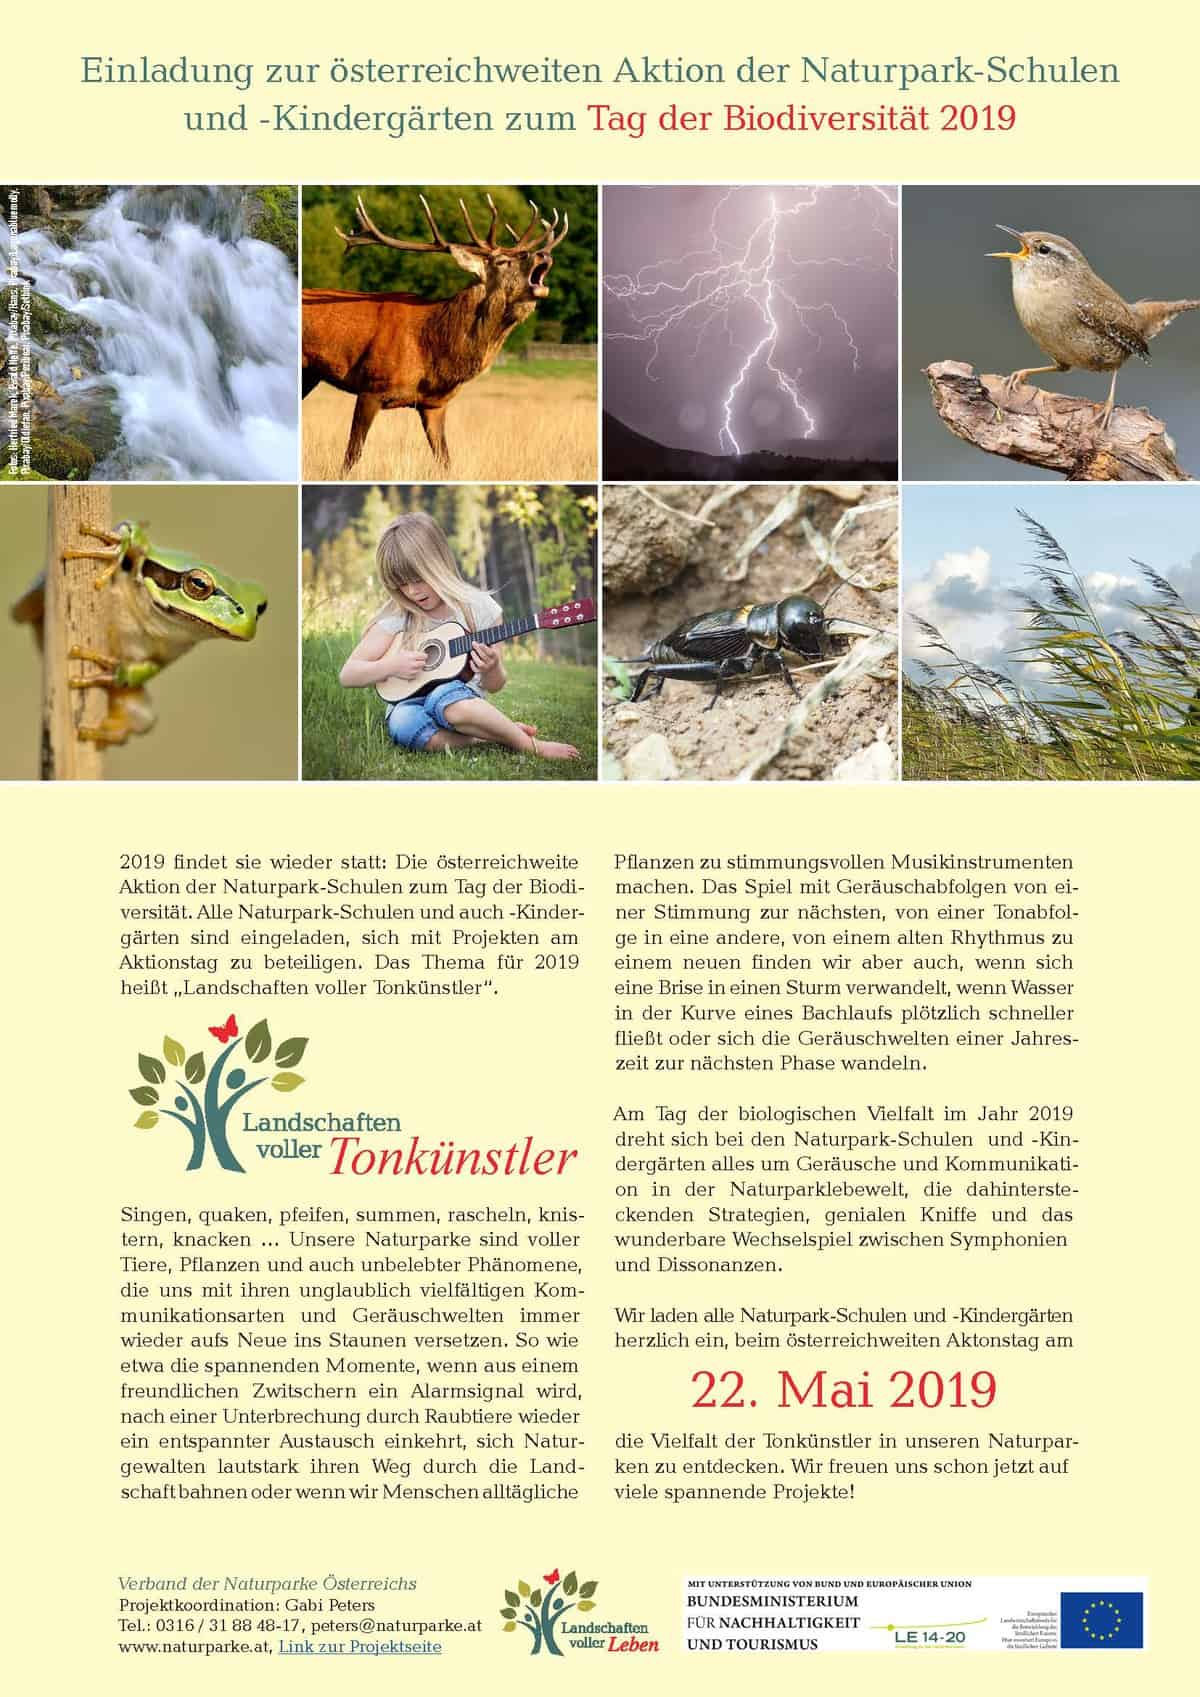 Tag der Artenvielfalt 2019 - Landschaften voller Tonkünstler 304